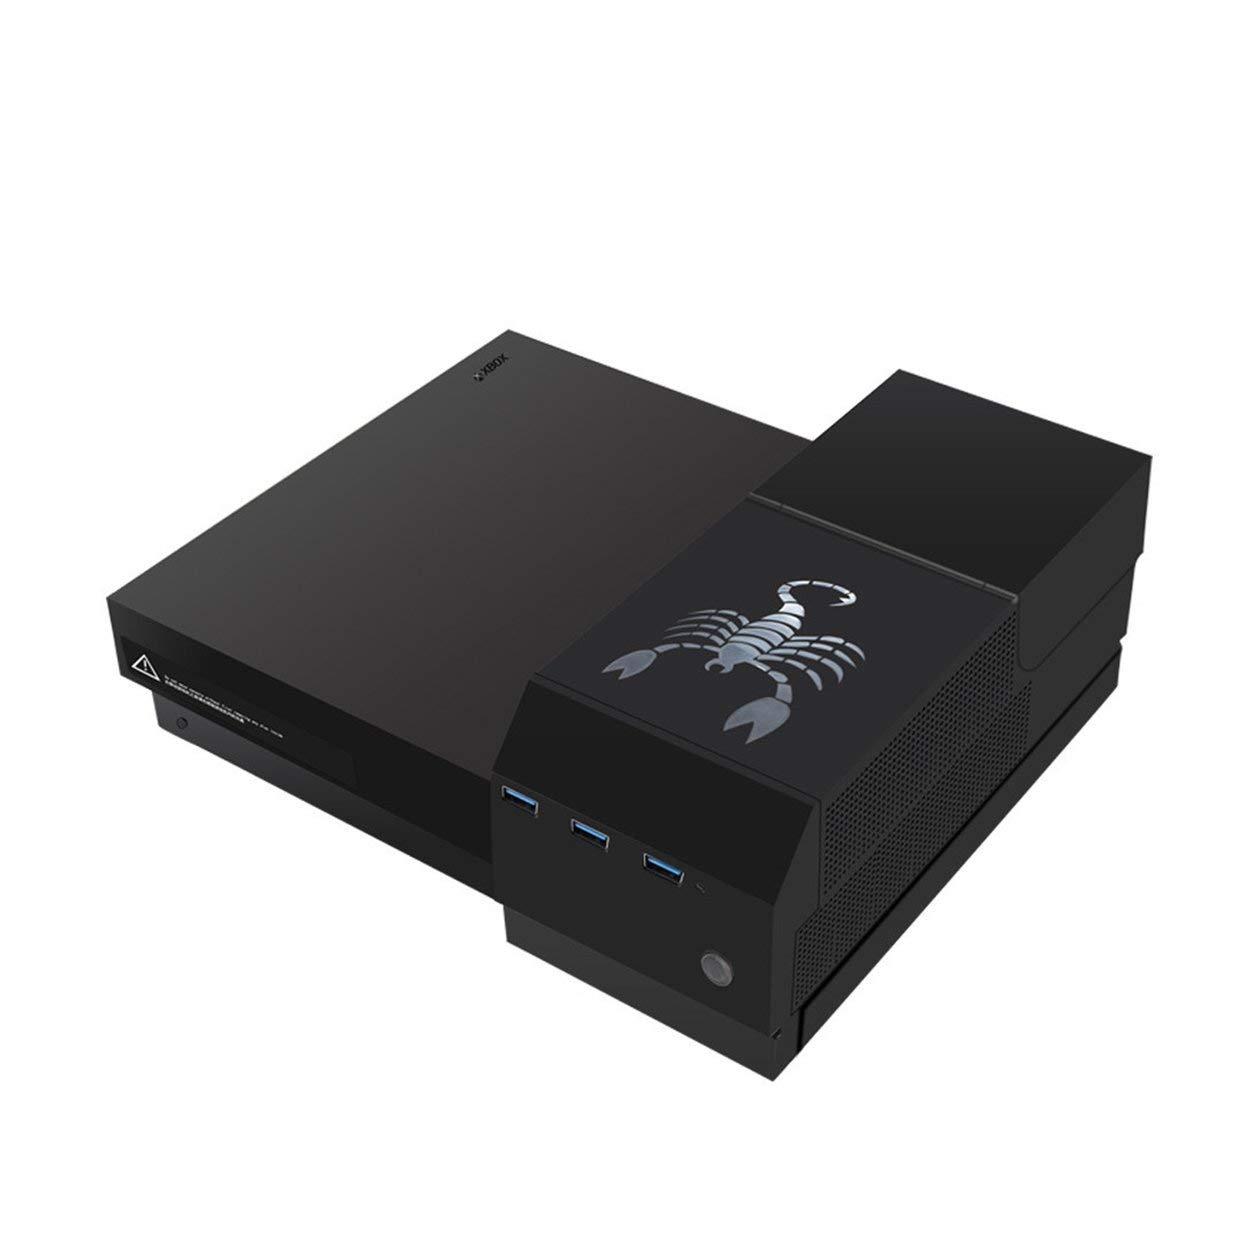 HONZIRY Caja de Disco Duro con concentrador USB 3.0 para Xbox One ...